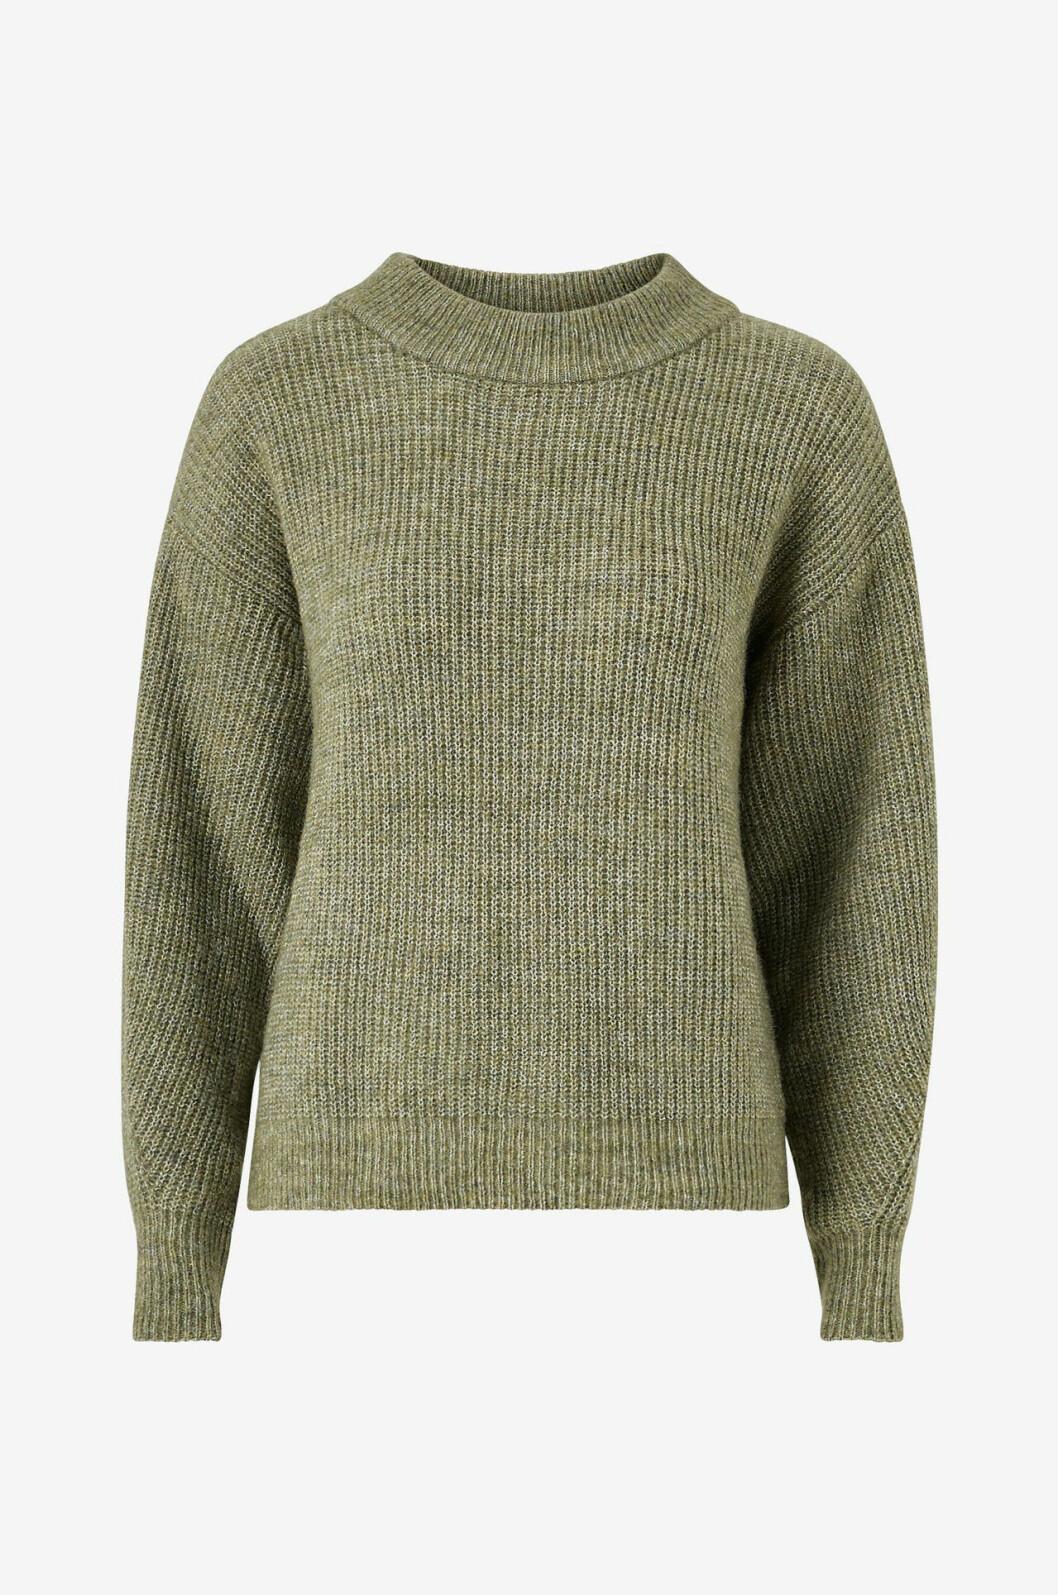 Grön stickad tröja från Ellos